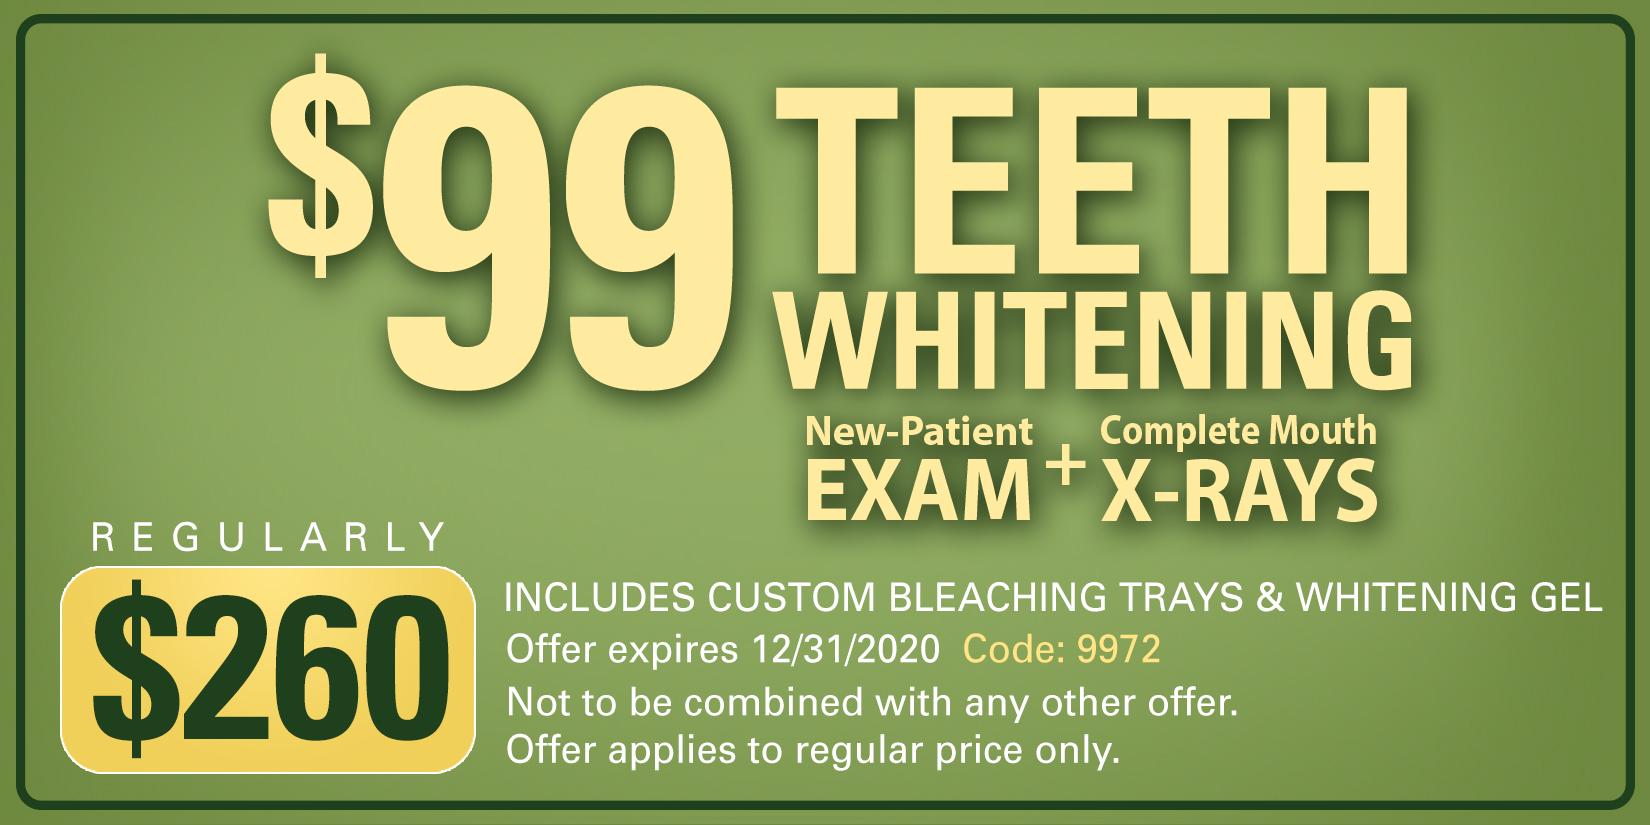 $99 teeth whitening